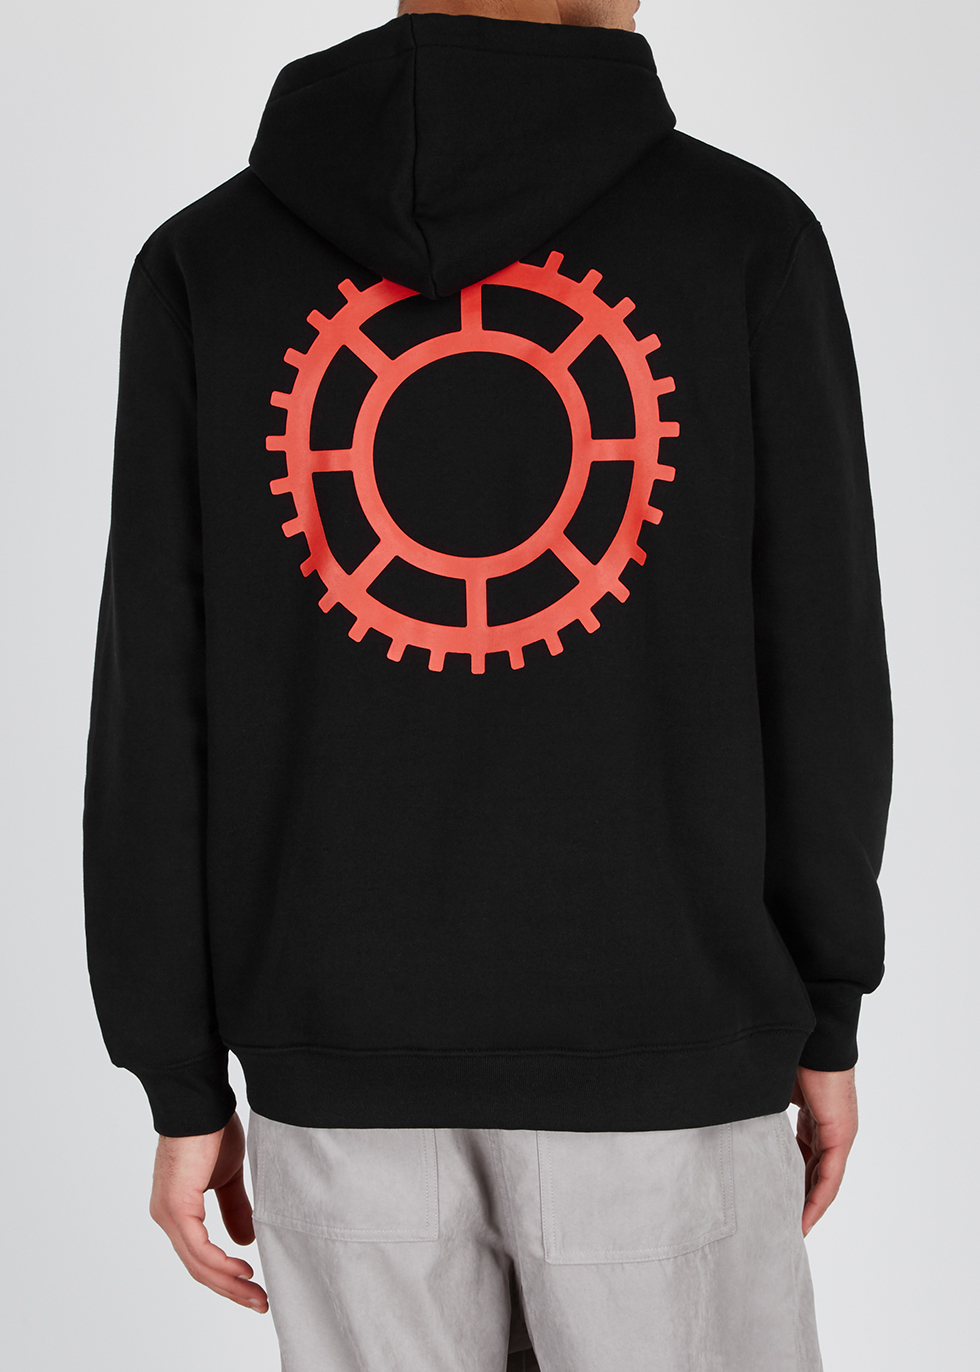 Omen printed cotton sweatshirt - 032c